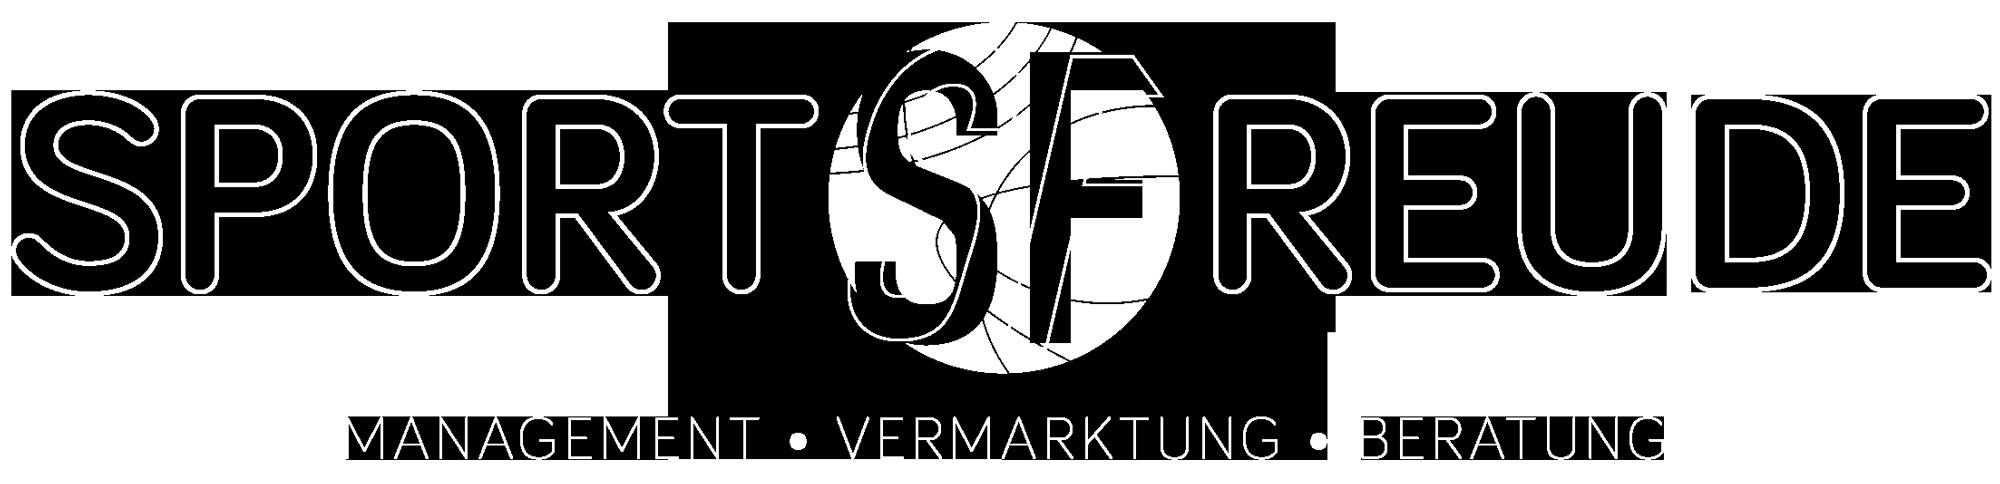 sportsfreude_logo3_white.png